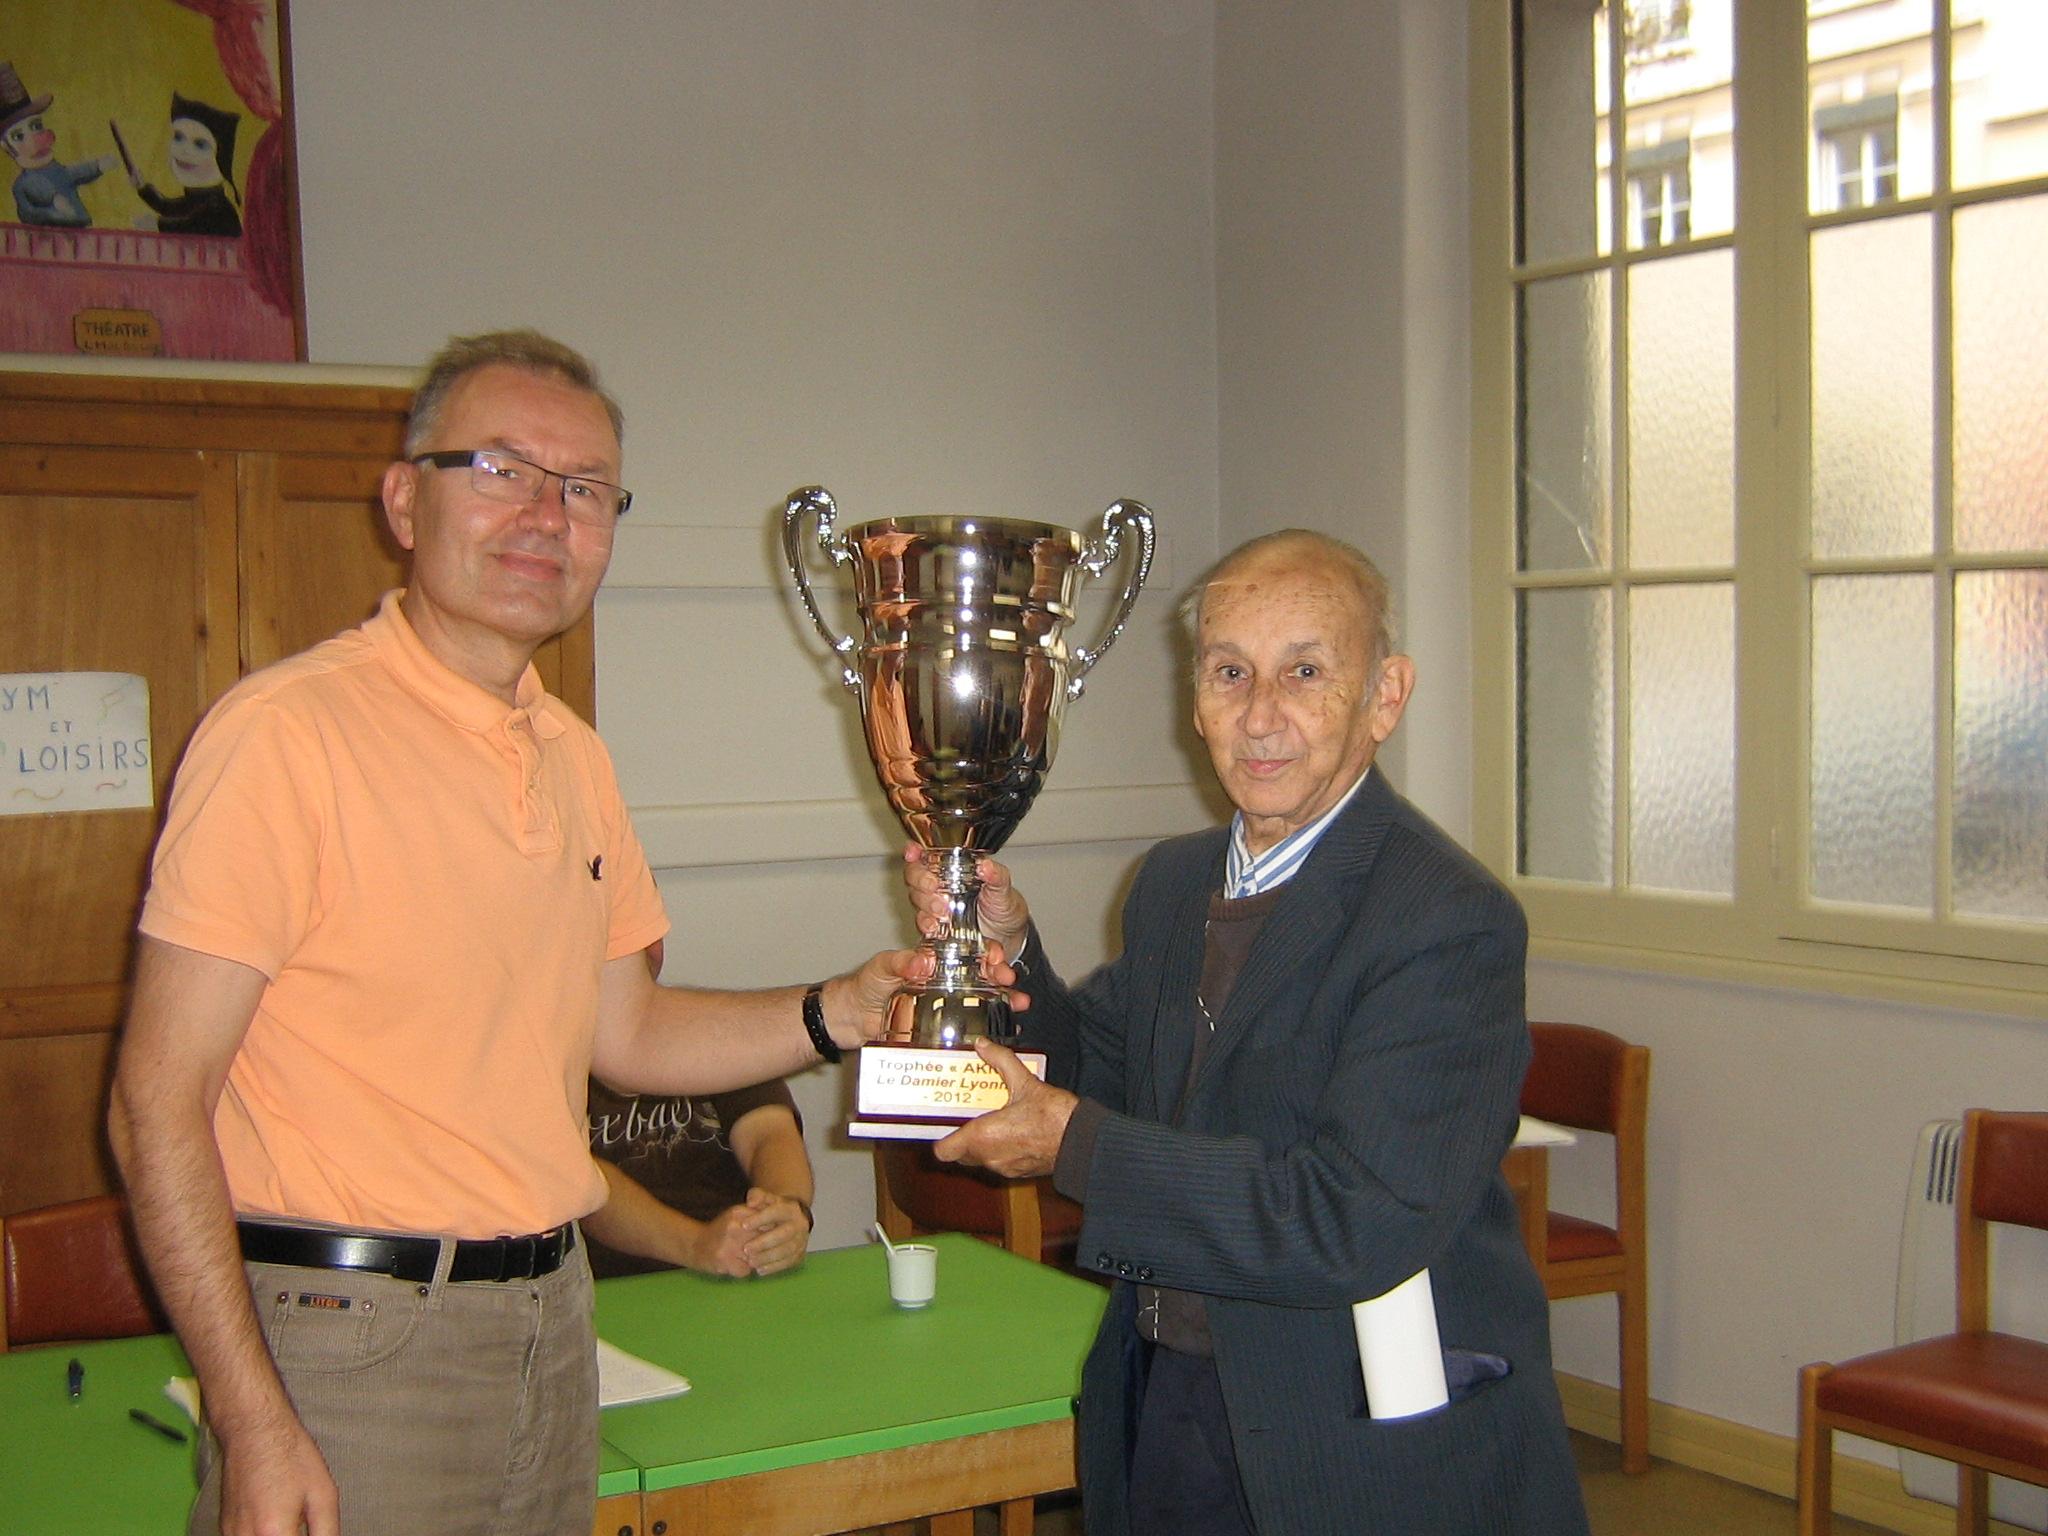 Richard Przewozniak et M. Aknin lui remetant le trophée.